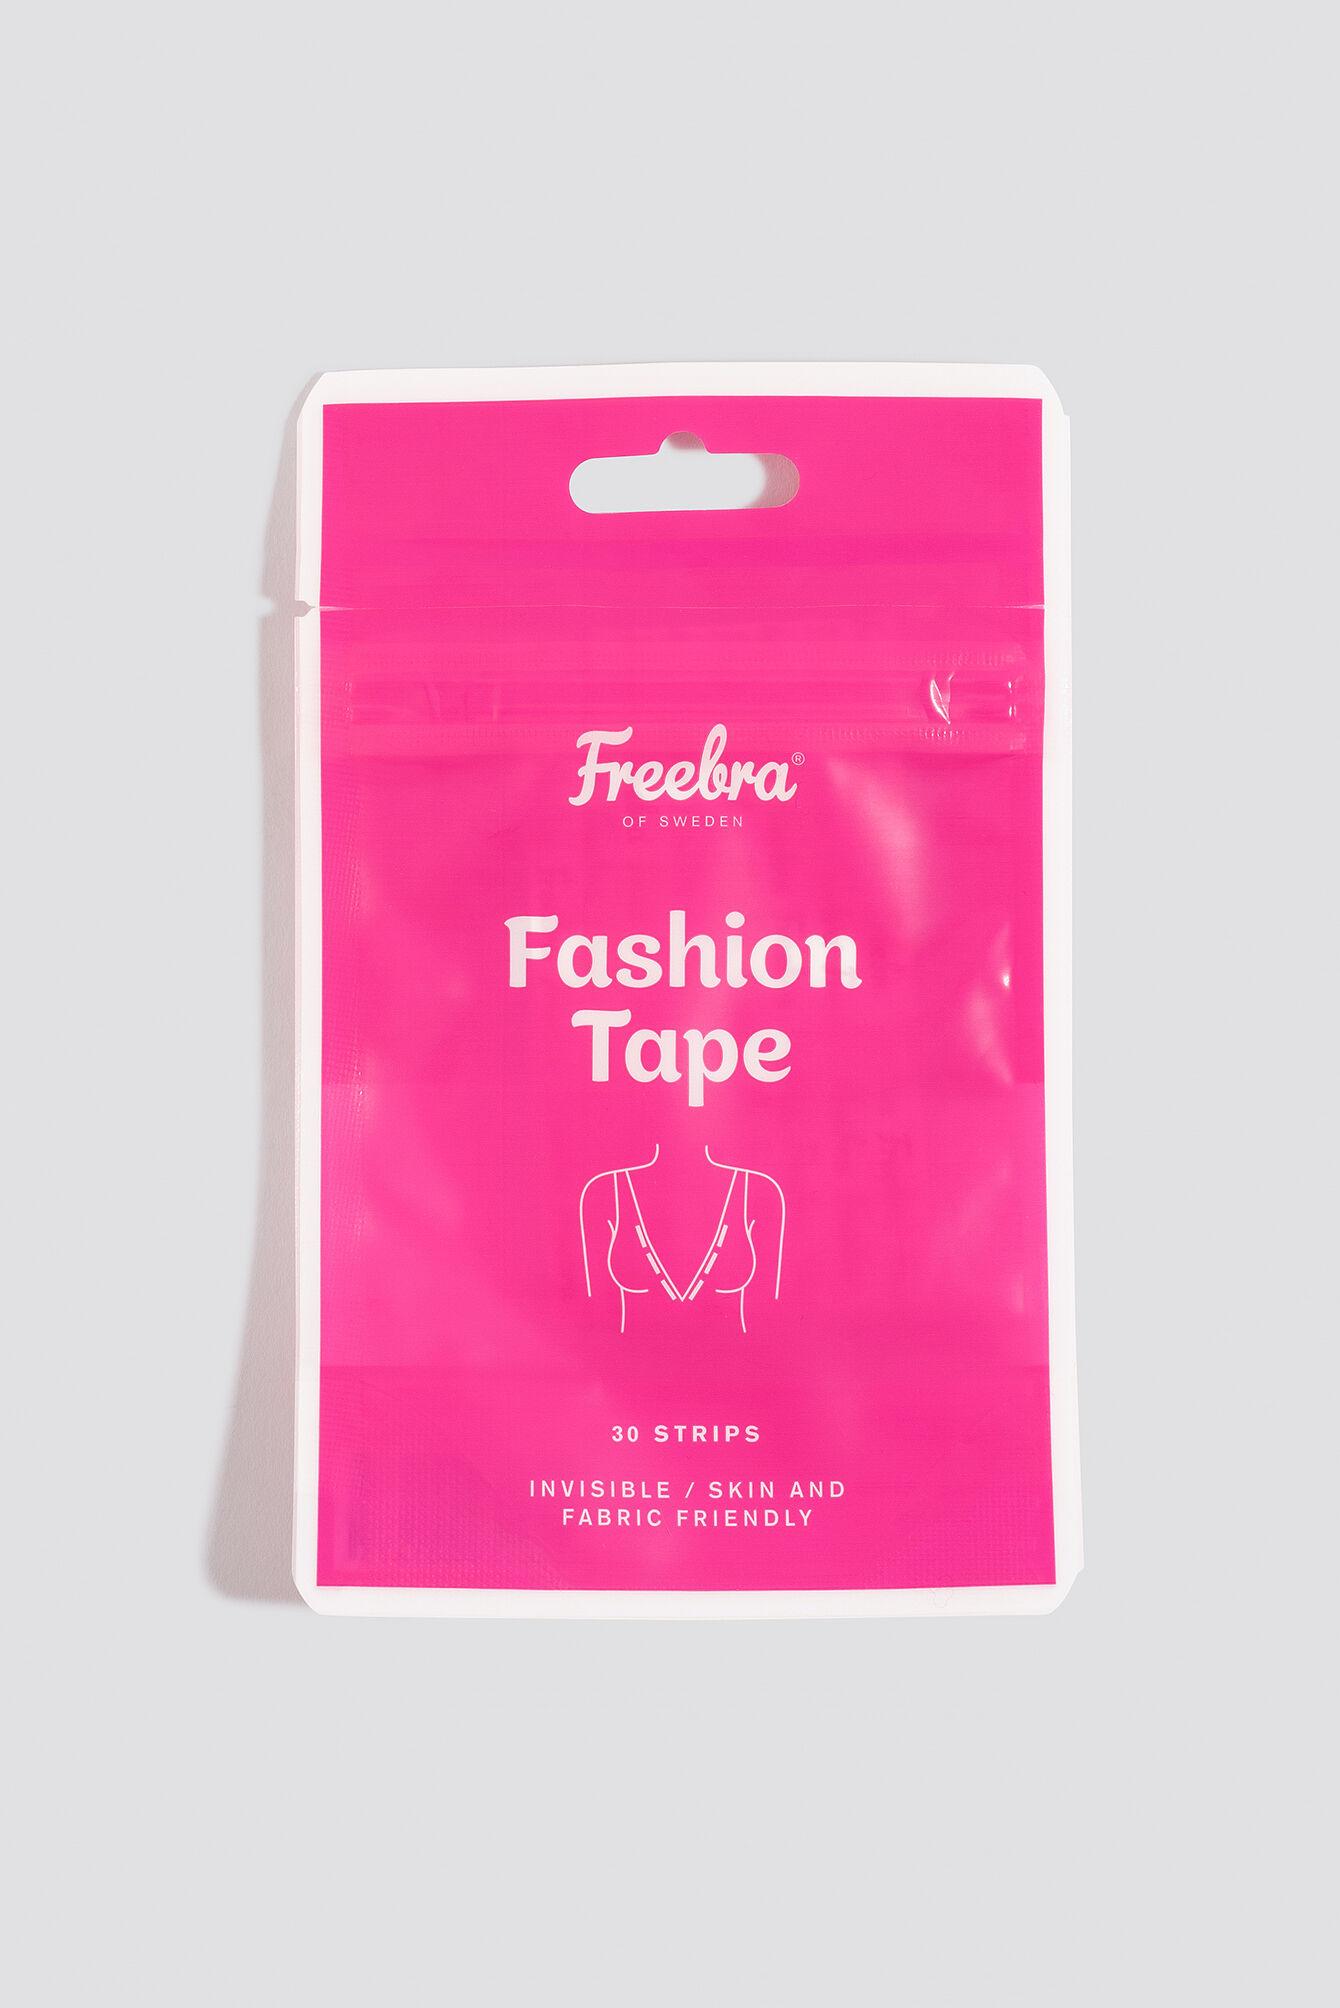 Freebra Fashion Tape - White  - Size: One Size